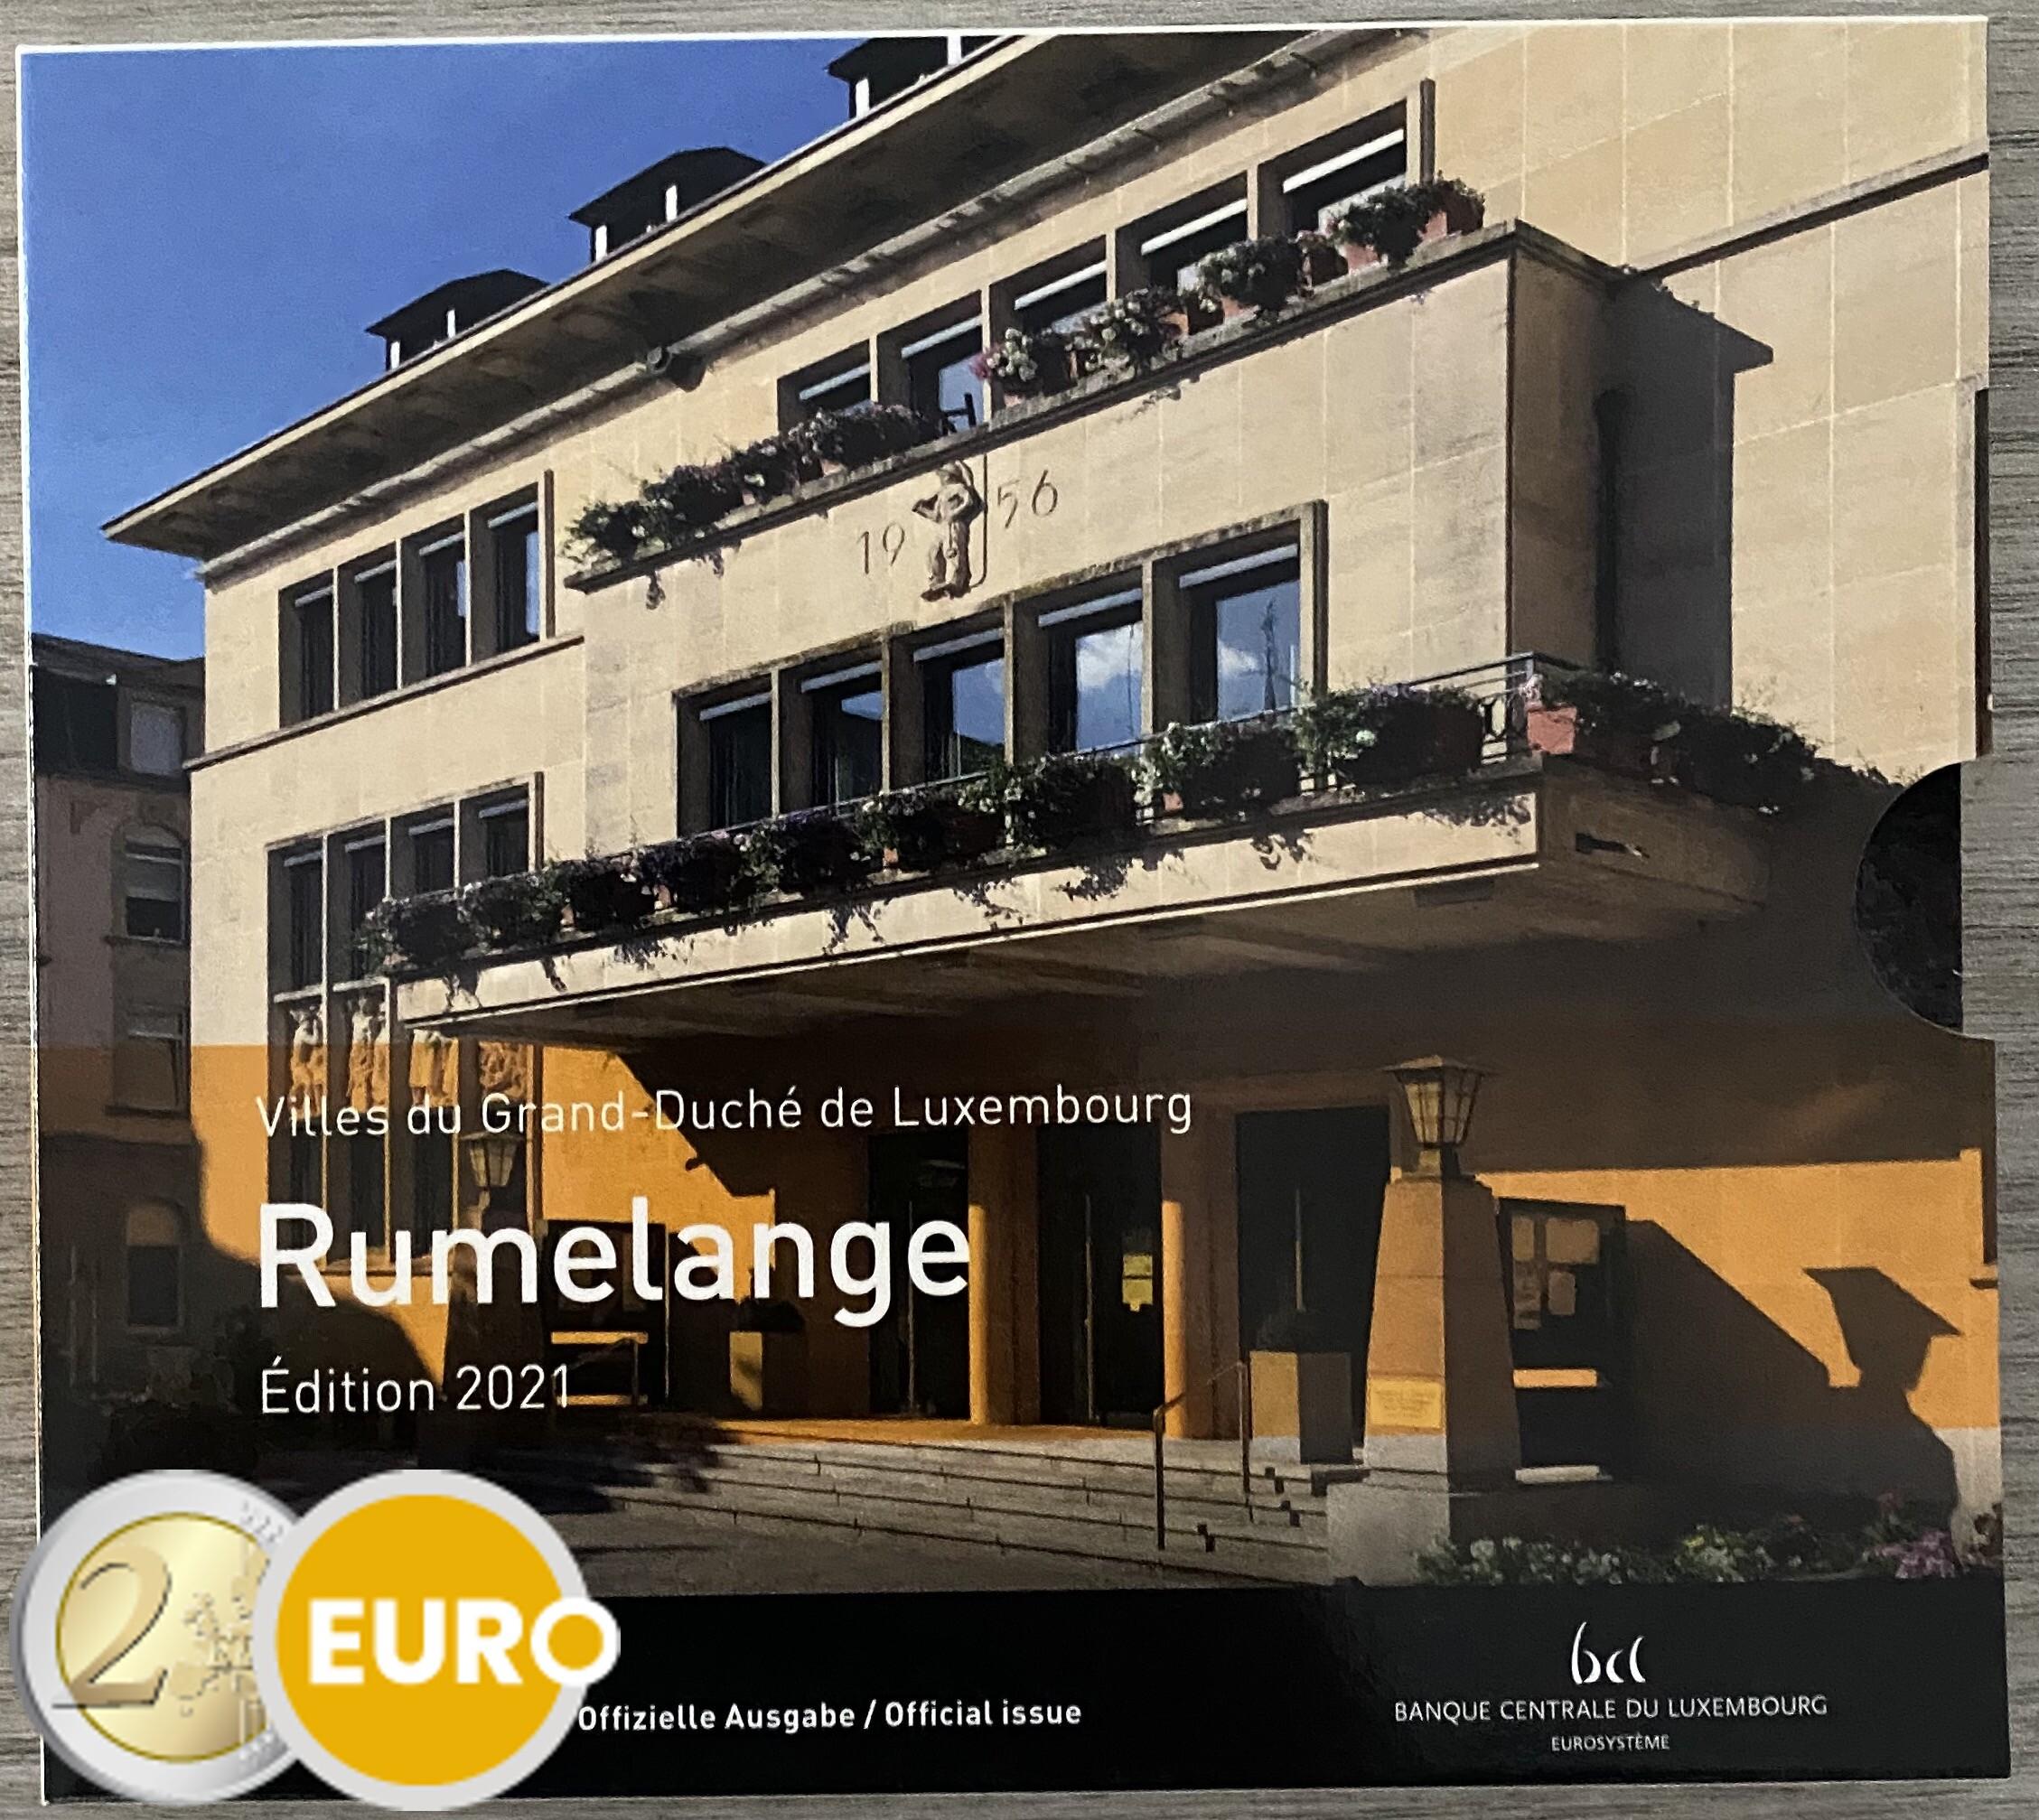 KMS Stgl. BU FDC Luxembourg 2021 Rümelingen + 2 euro Hochzeitstag Henri Foto